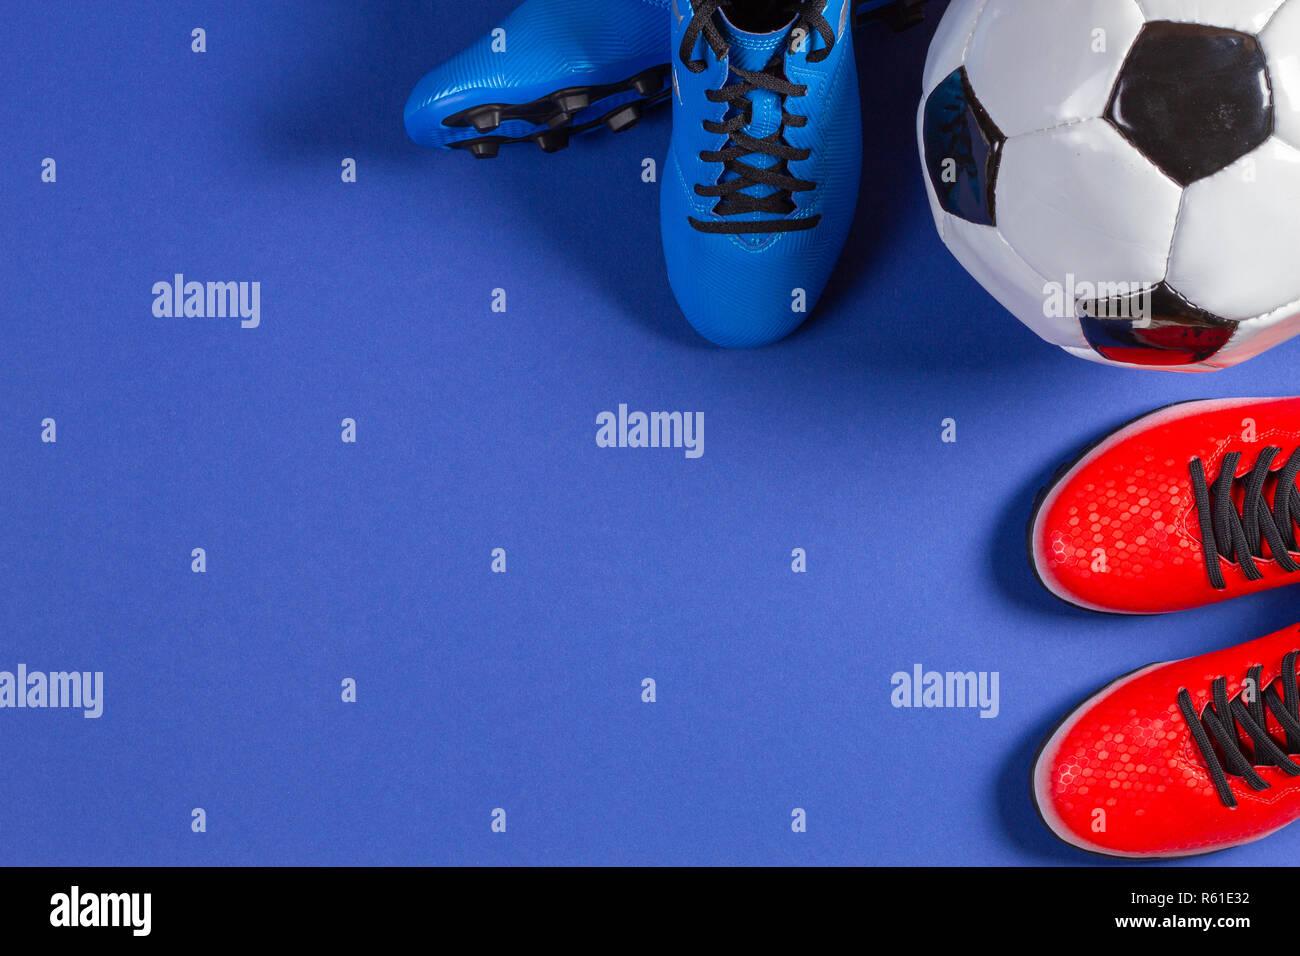 Vista superior de un balón de fútbol y dos pares de zapatos deportivos de  fútbol sobre d976c139675a2